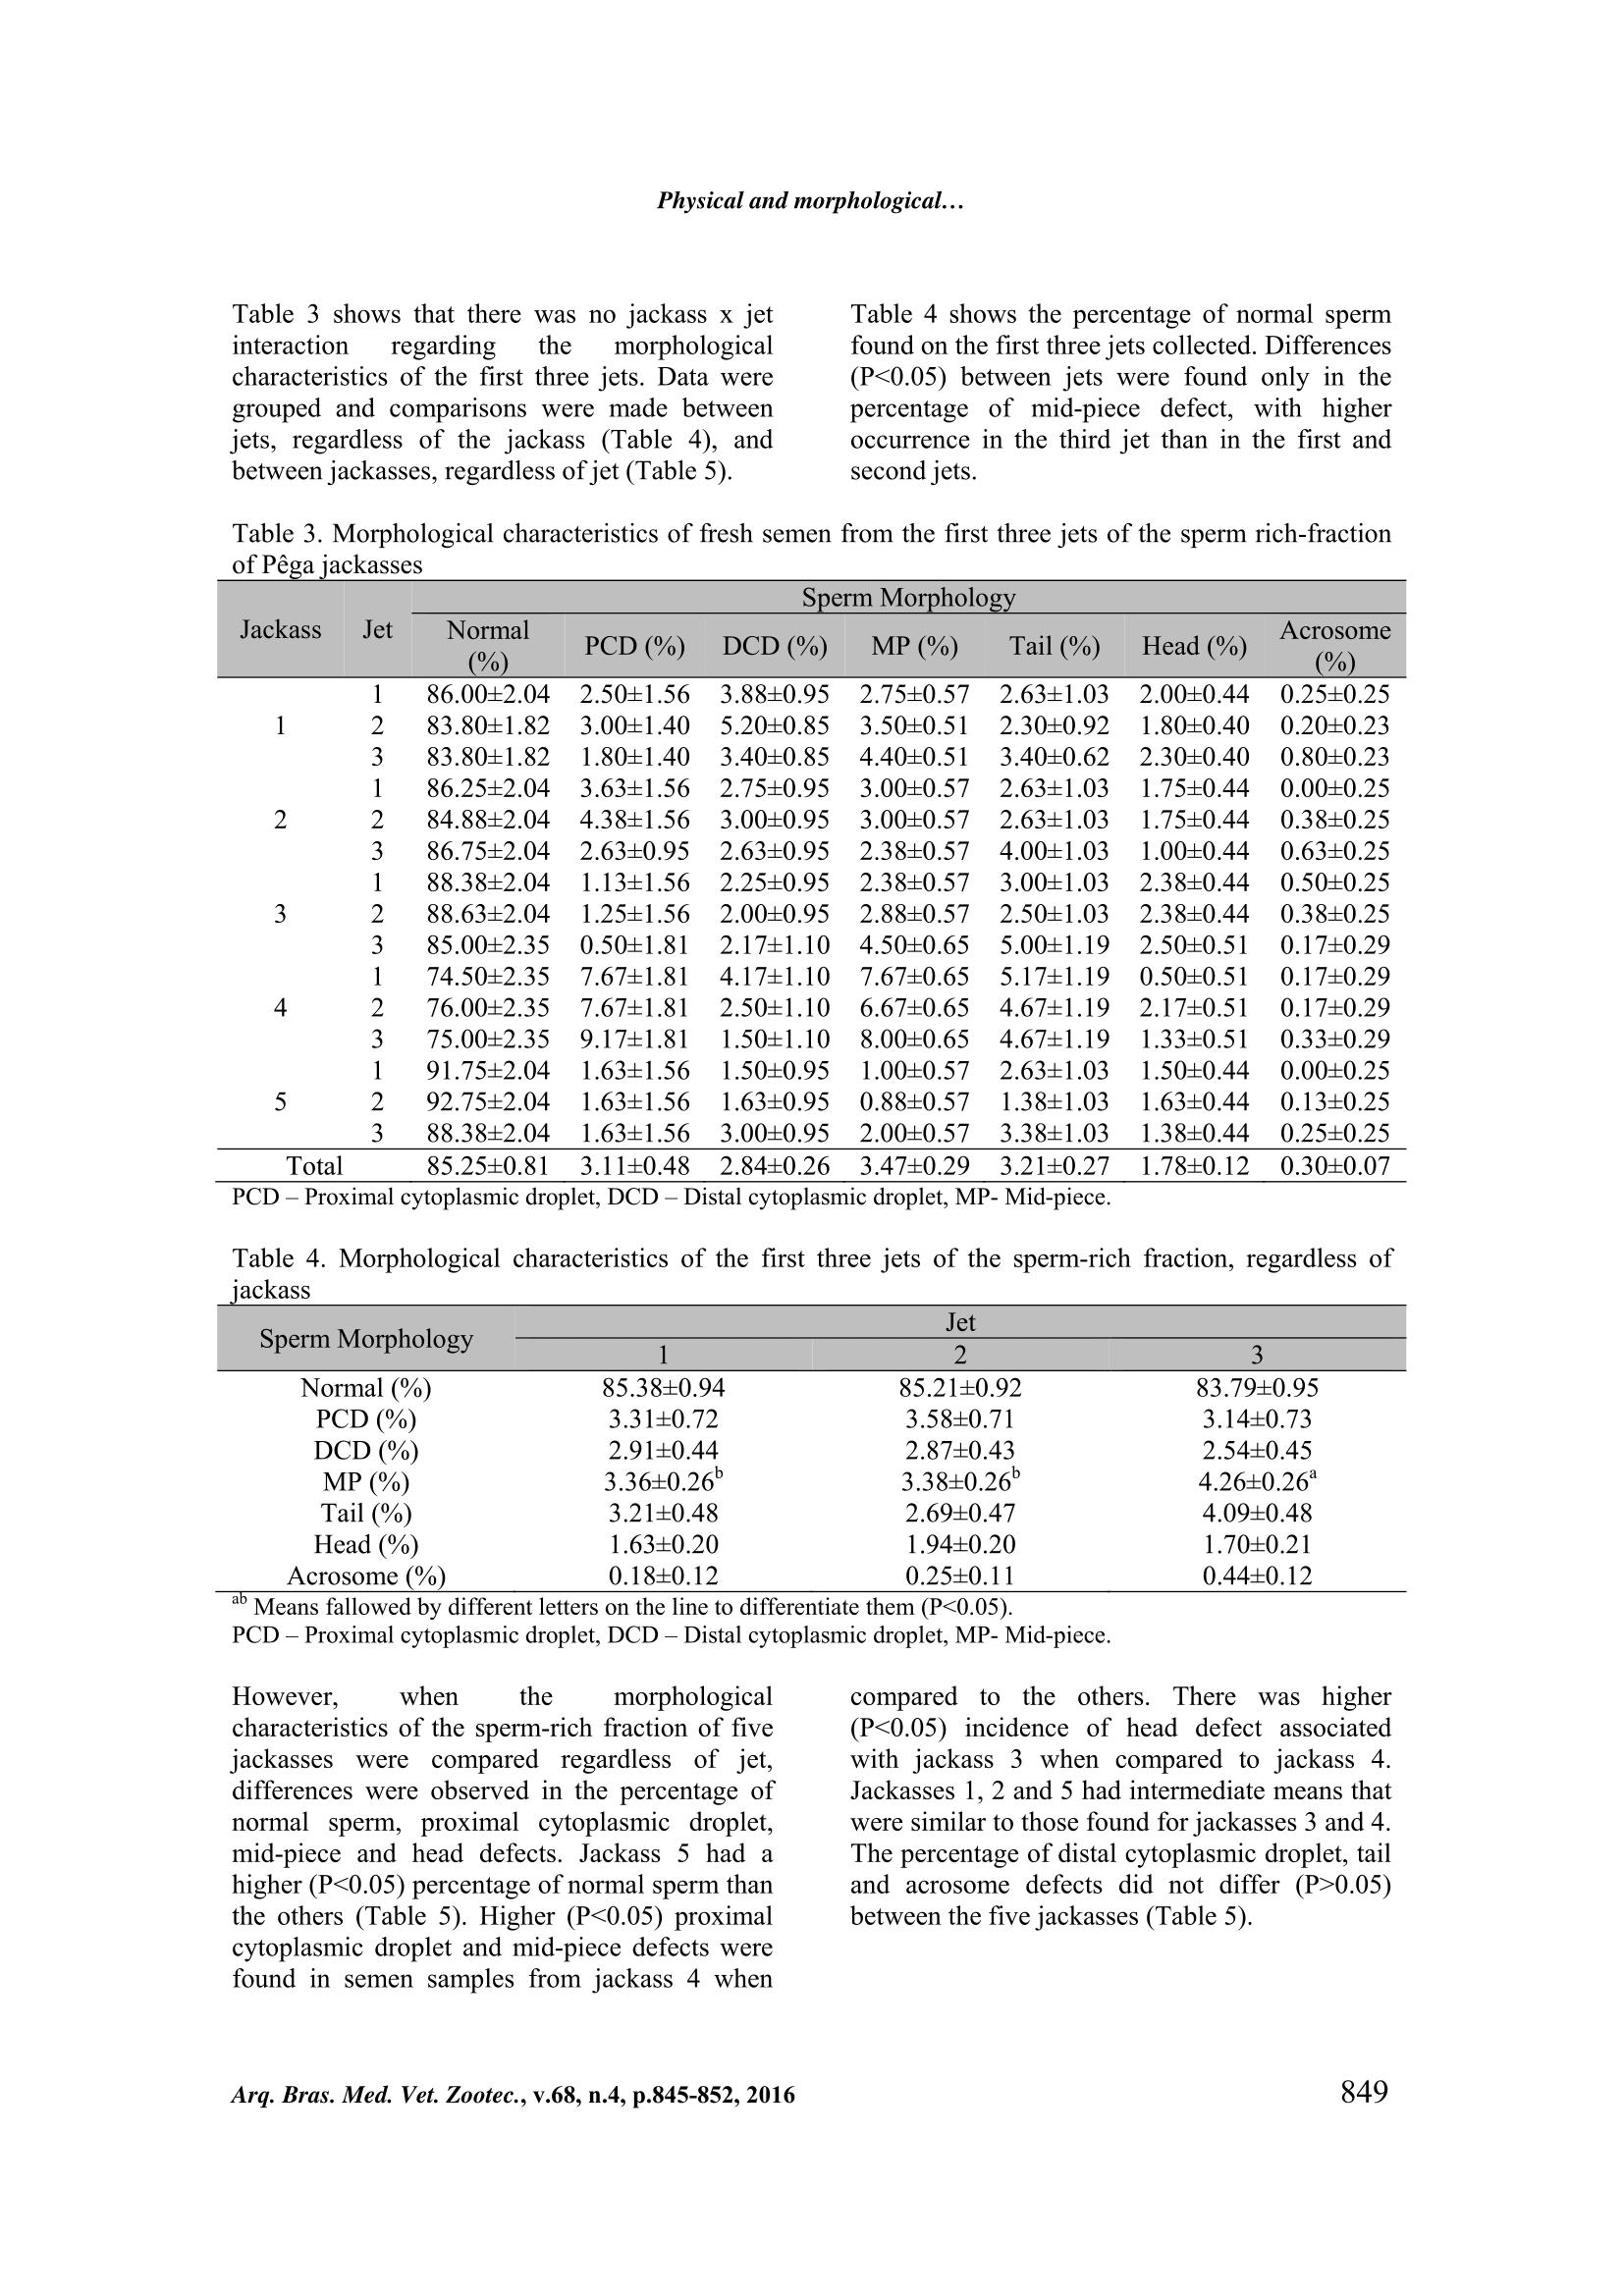 AMA 2-5 (1).png